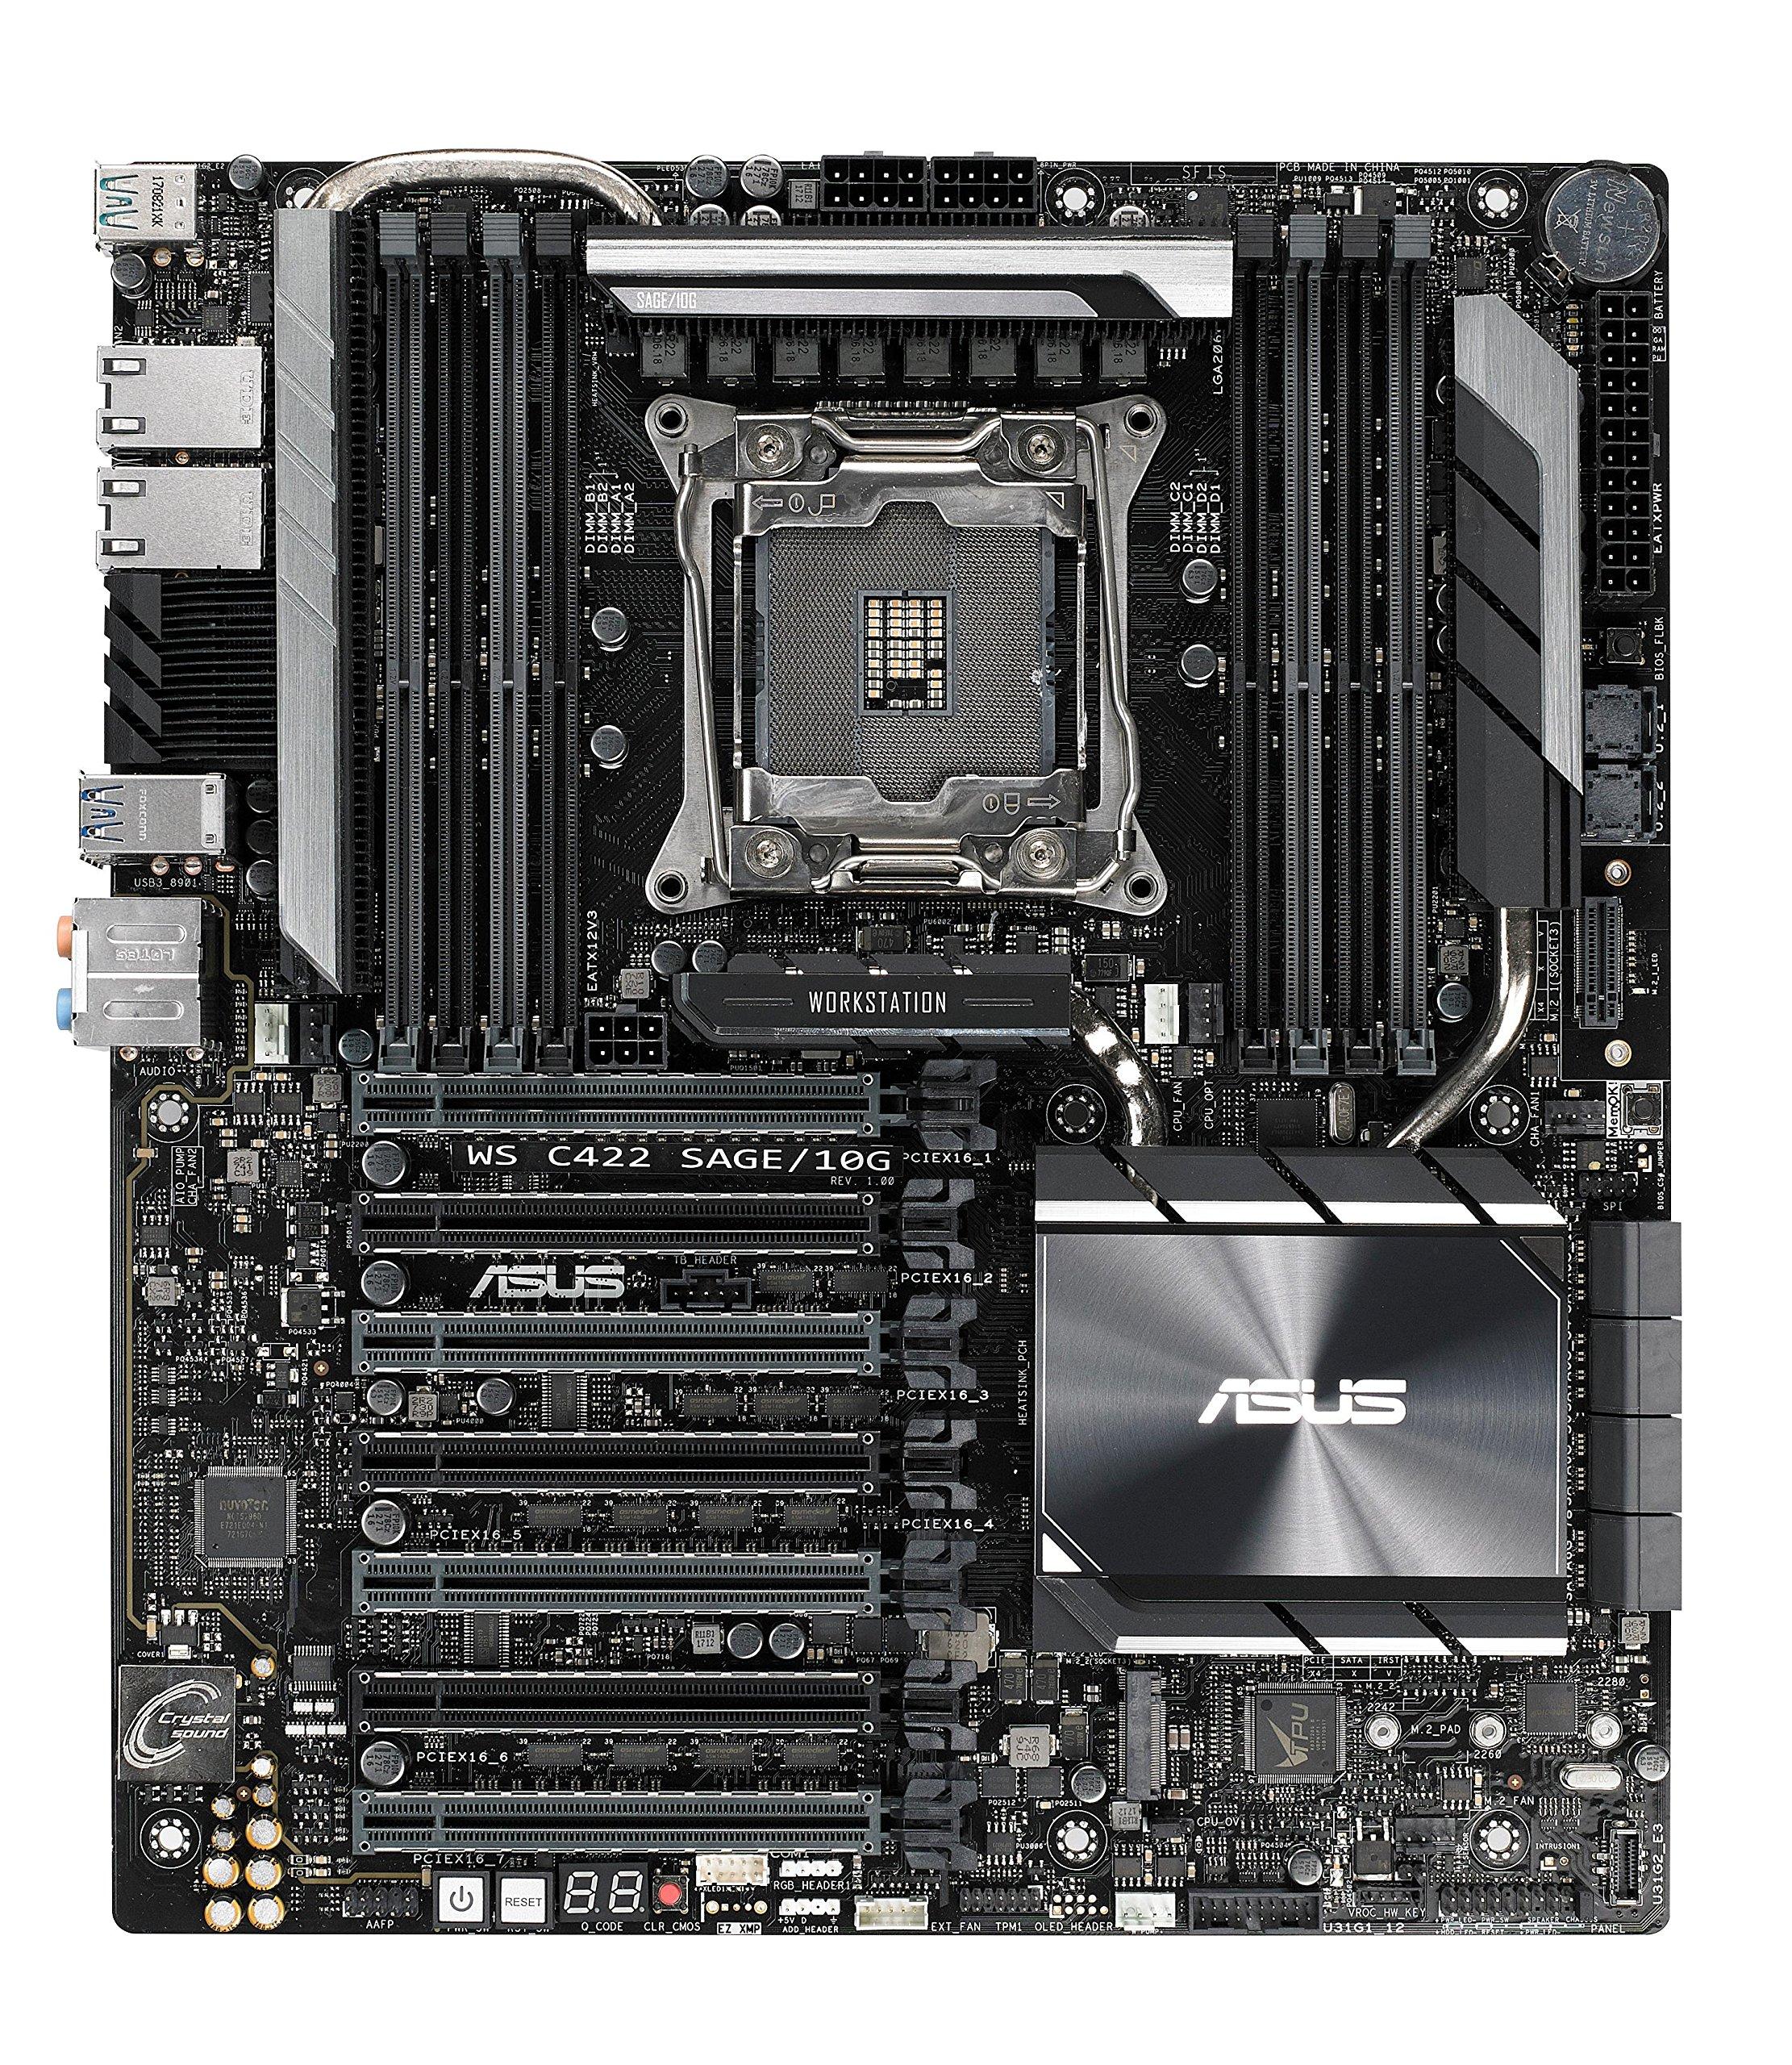 ASUS WS C422 SAGE/10G LGA2066 ECC DDR4 M.2 U.2 C422 ATX Moth